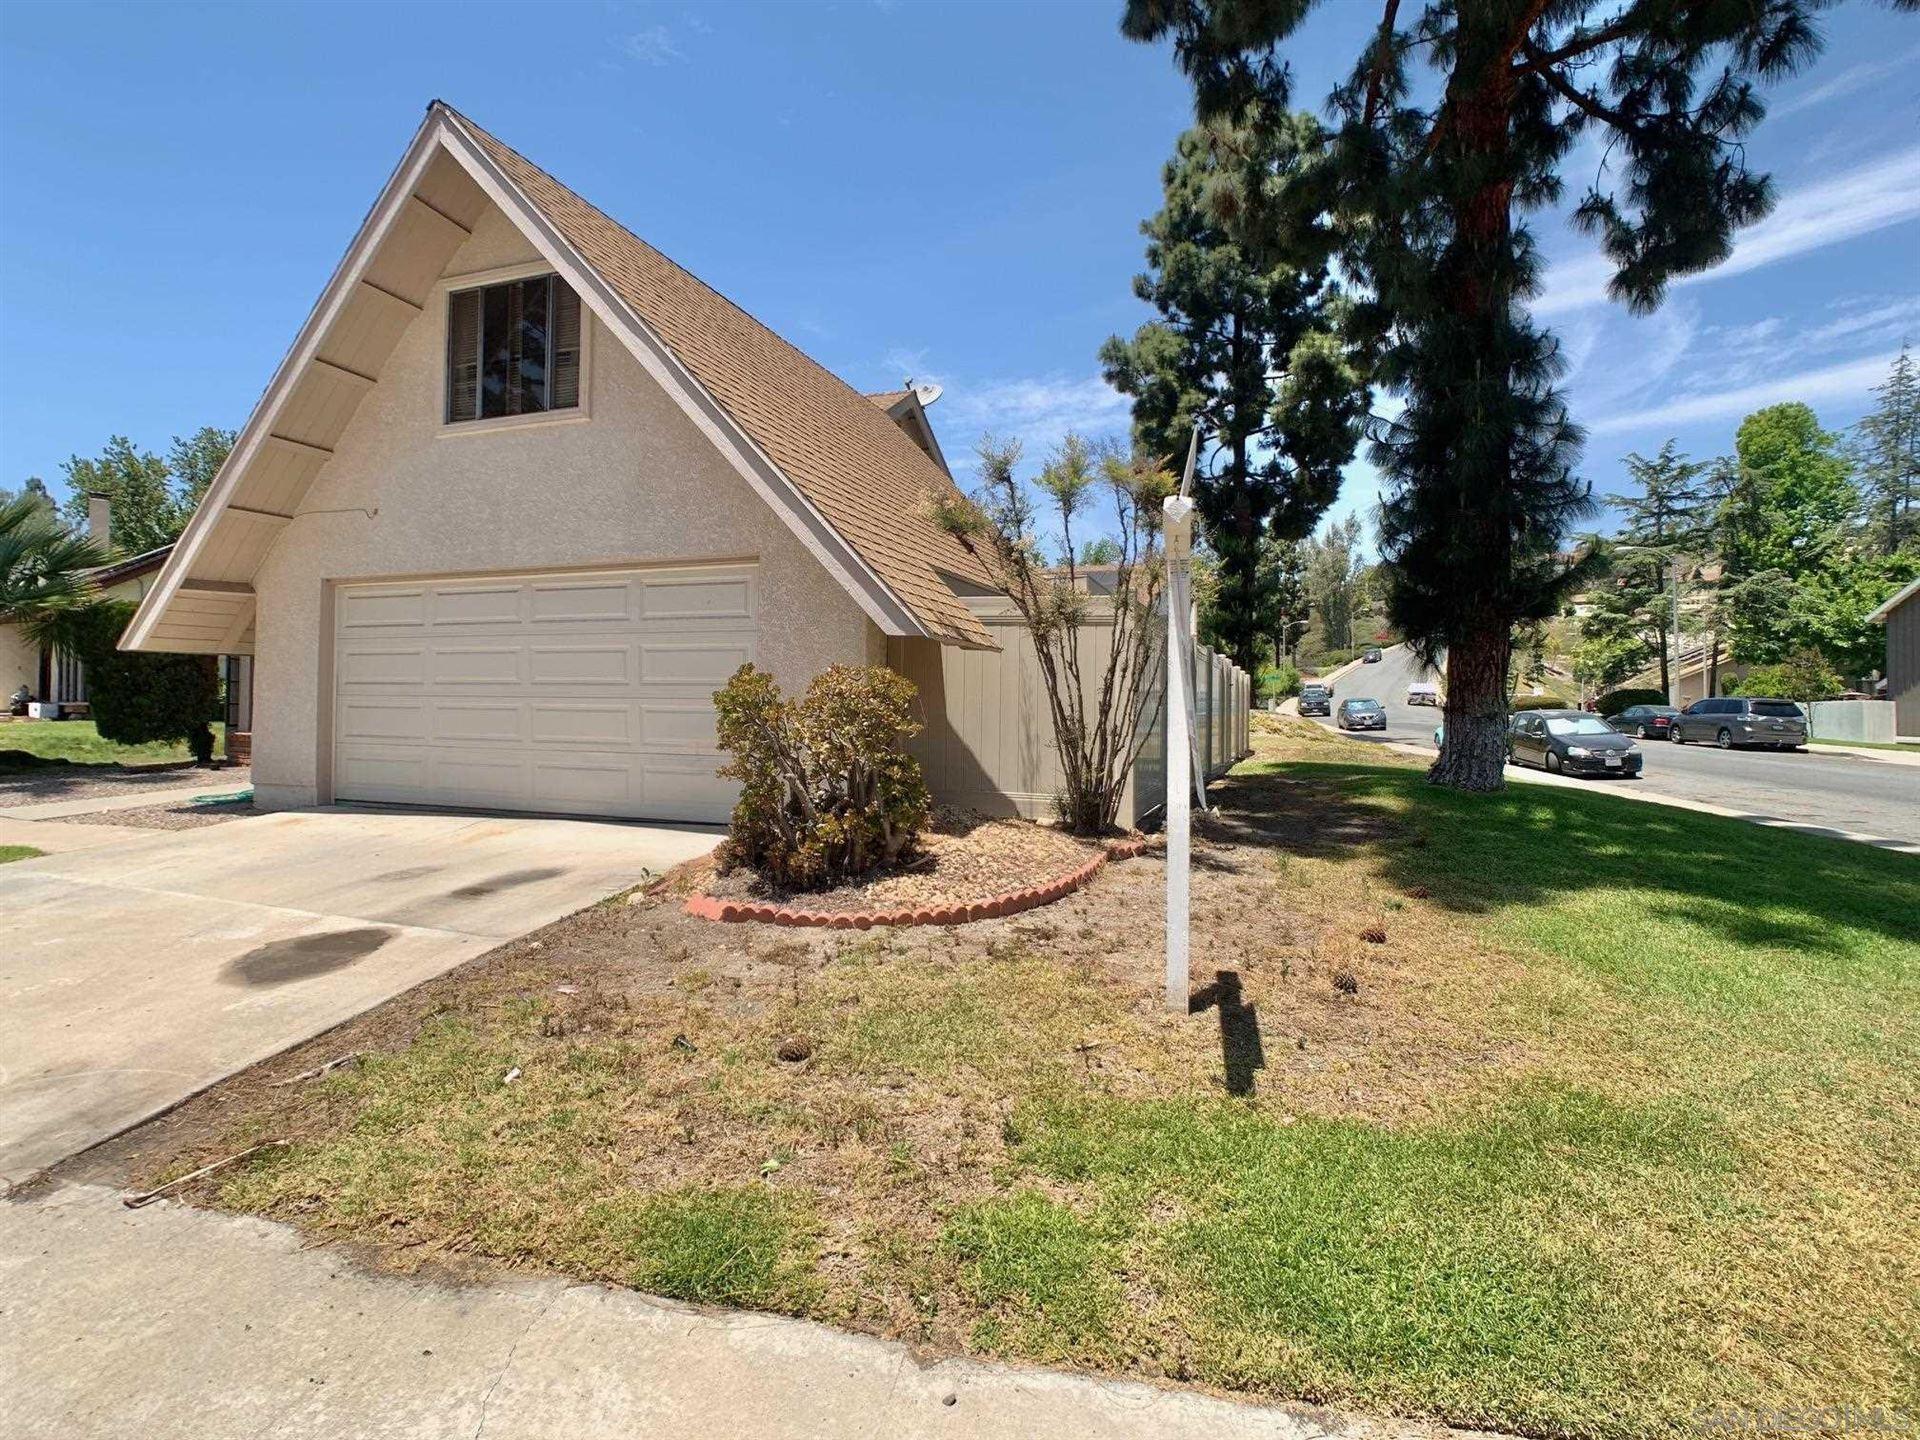 Photo of 10082 CANYONWOOD LANE, Spring Valley, CA 91977 (MLS # 210014250)